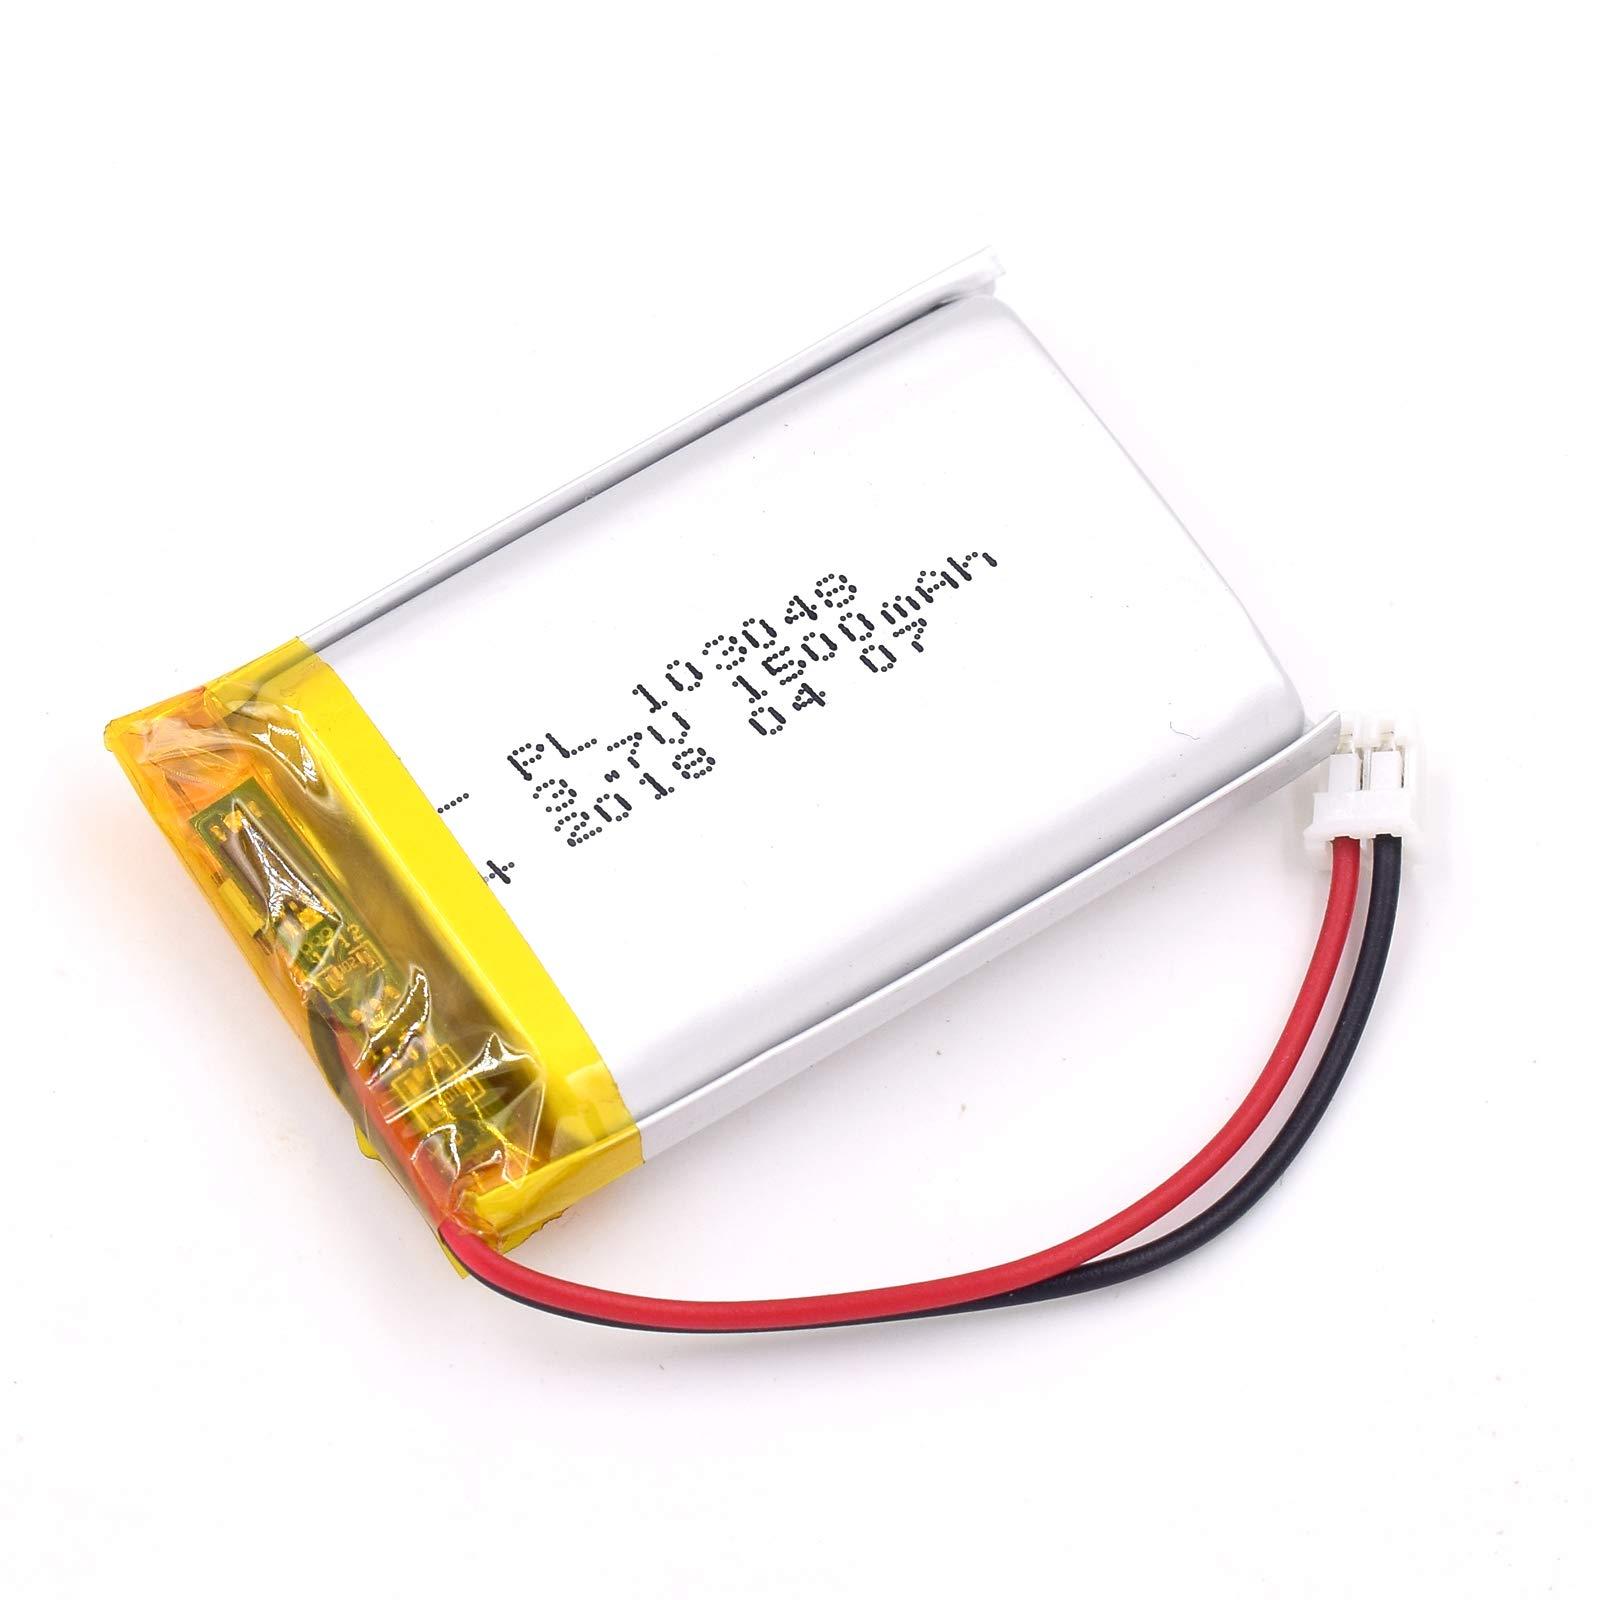 Bateria Lipo 3.7v 1500mah 10304